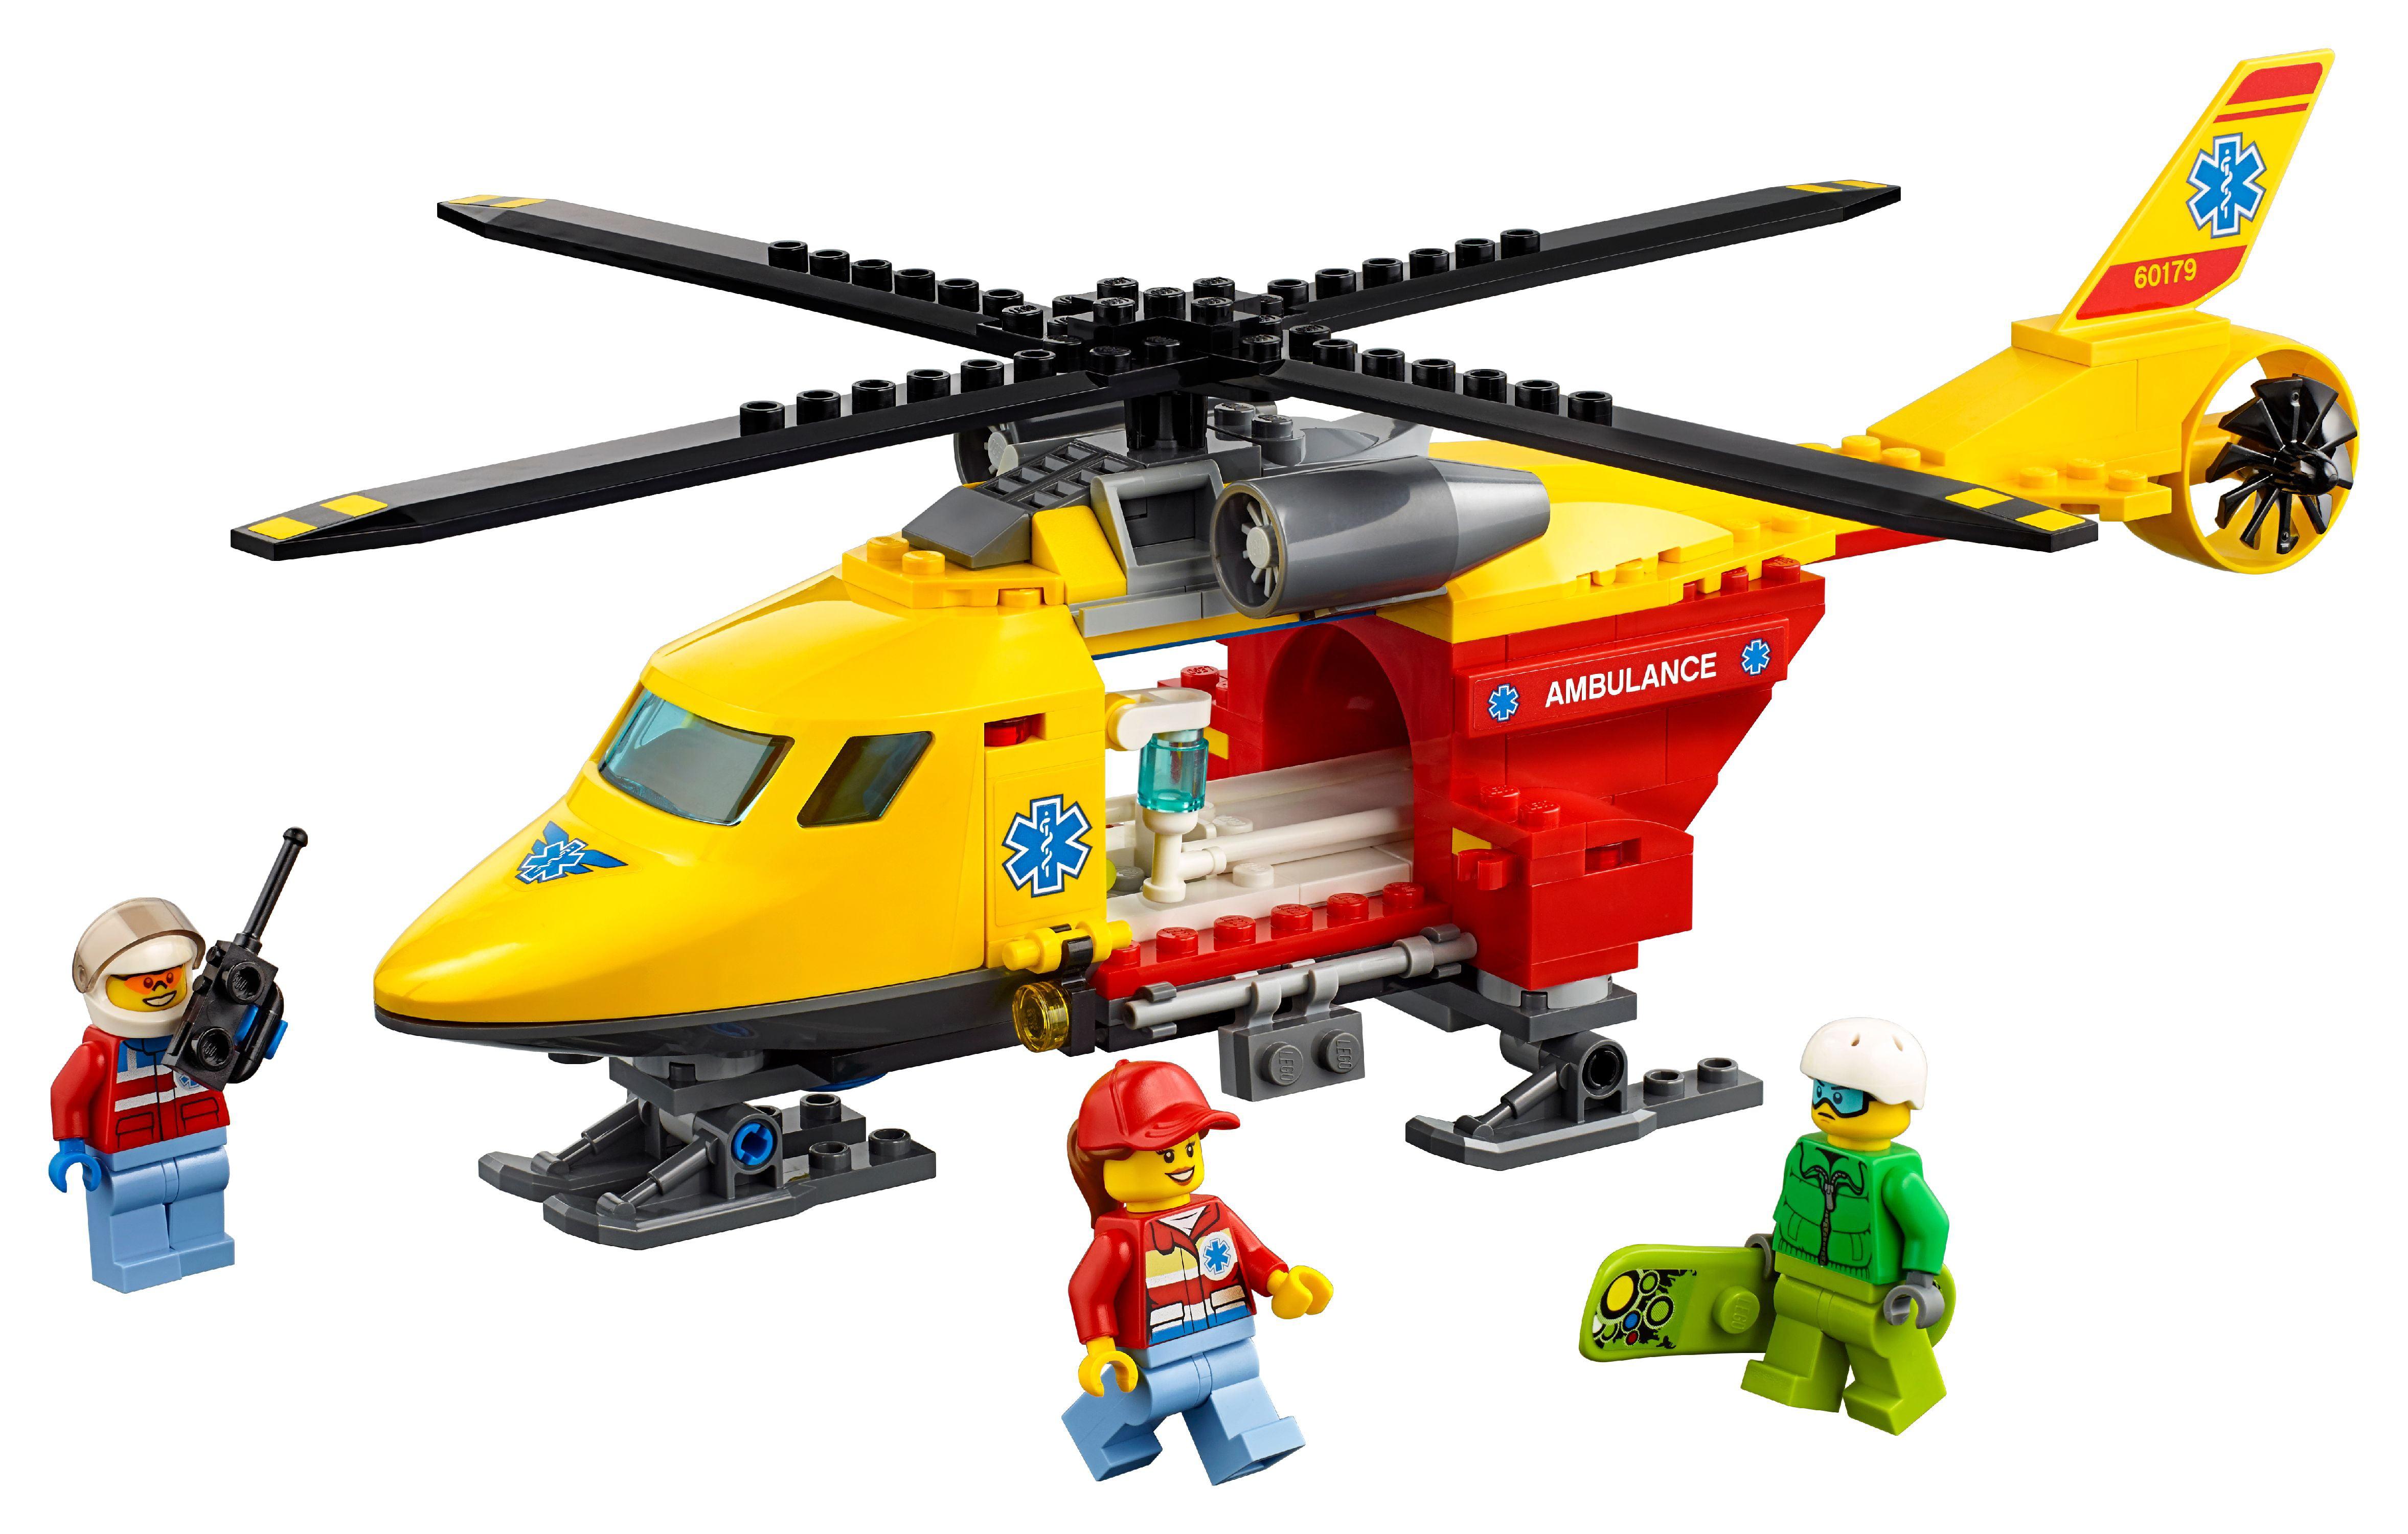 Lego City Ambulance Helicopter 60179 by LEGO System Inc